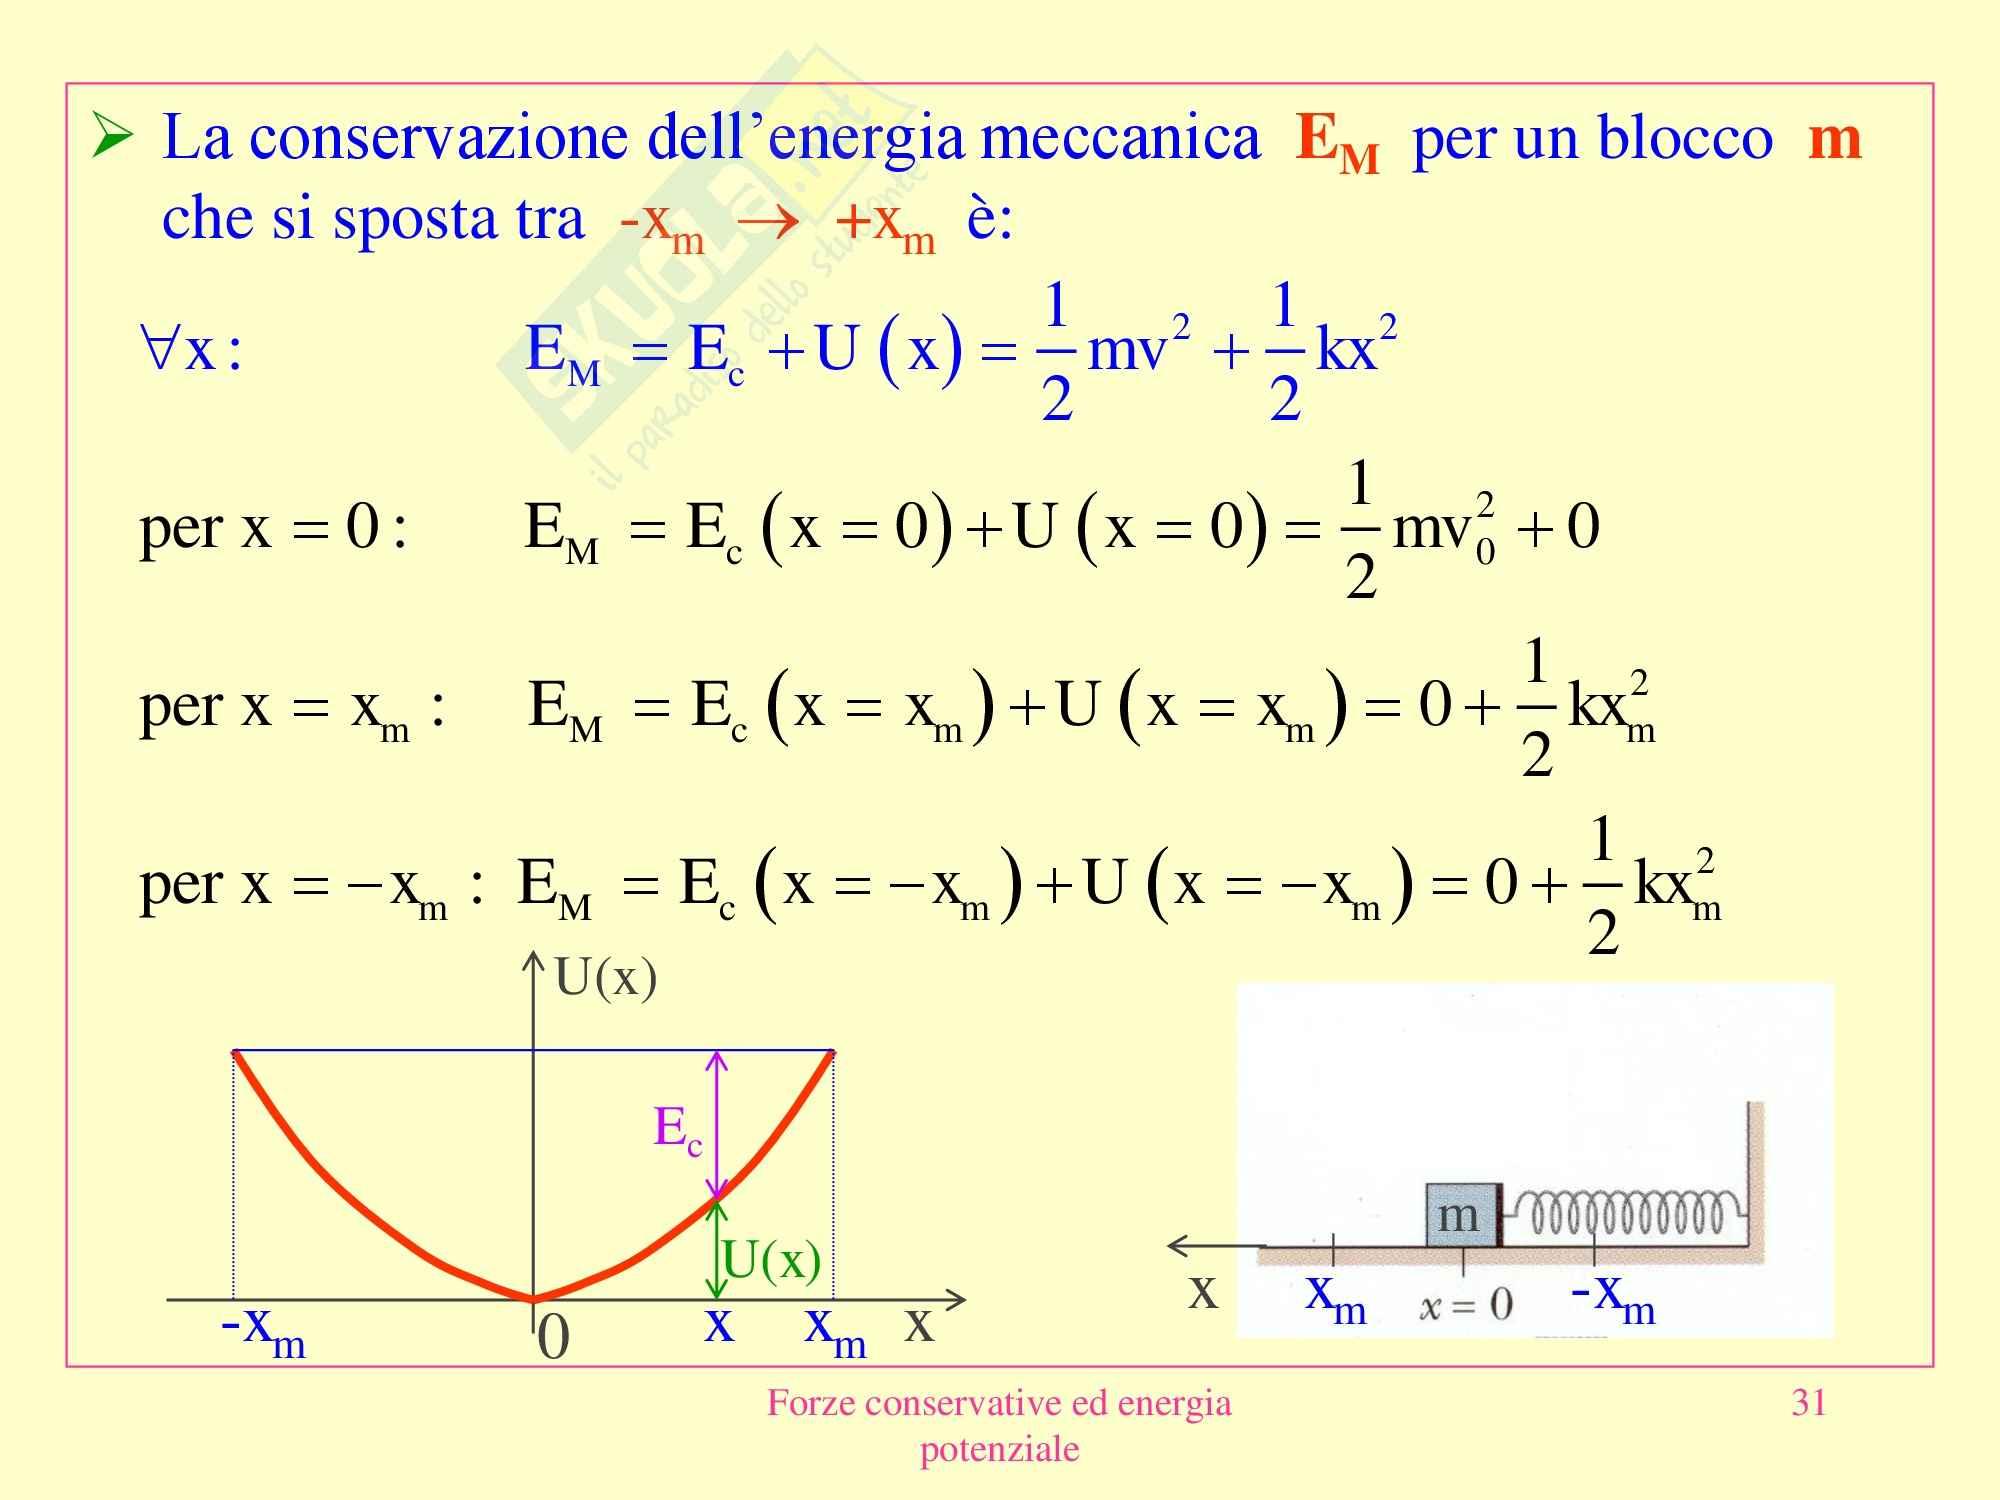 Fisica medica - Forze conservative ed energia potenziale Pag. 31